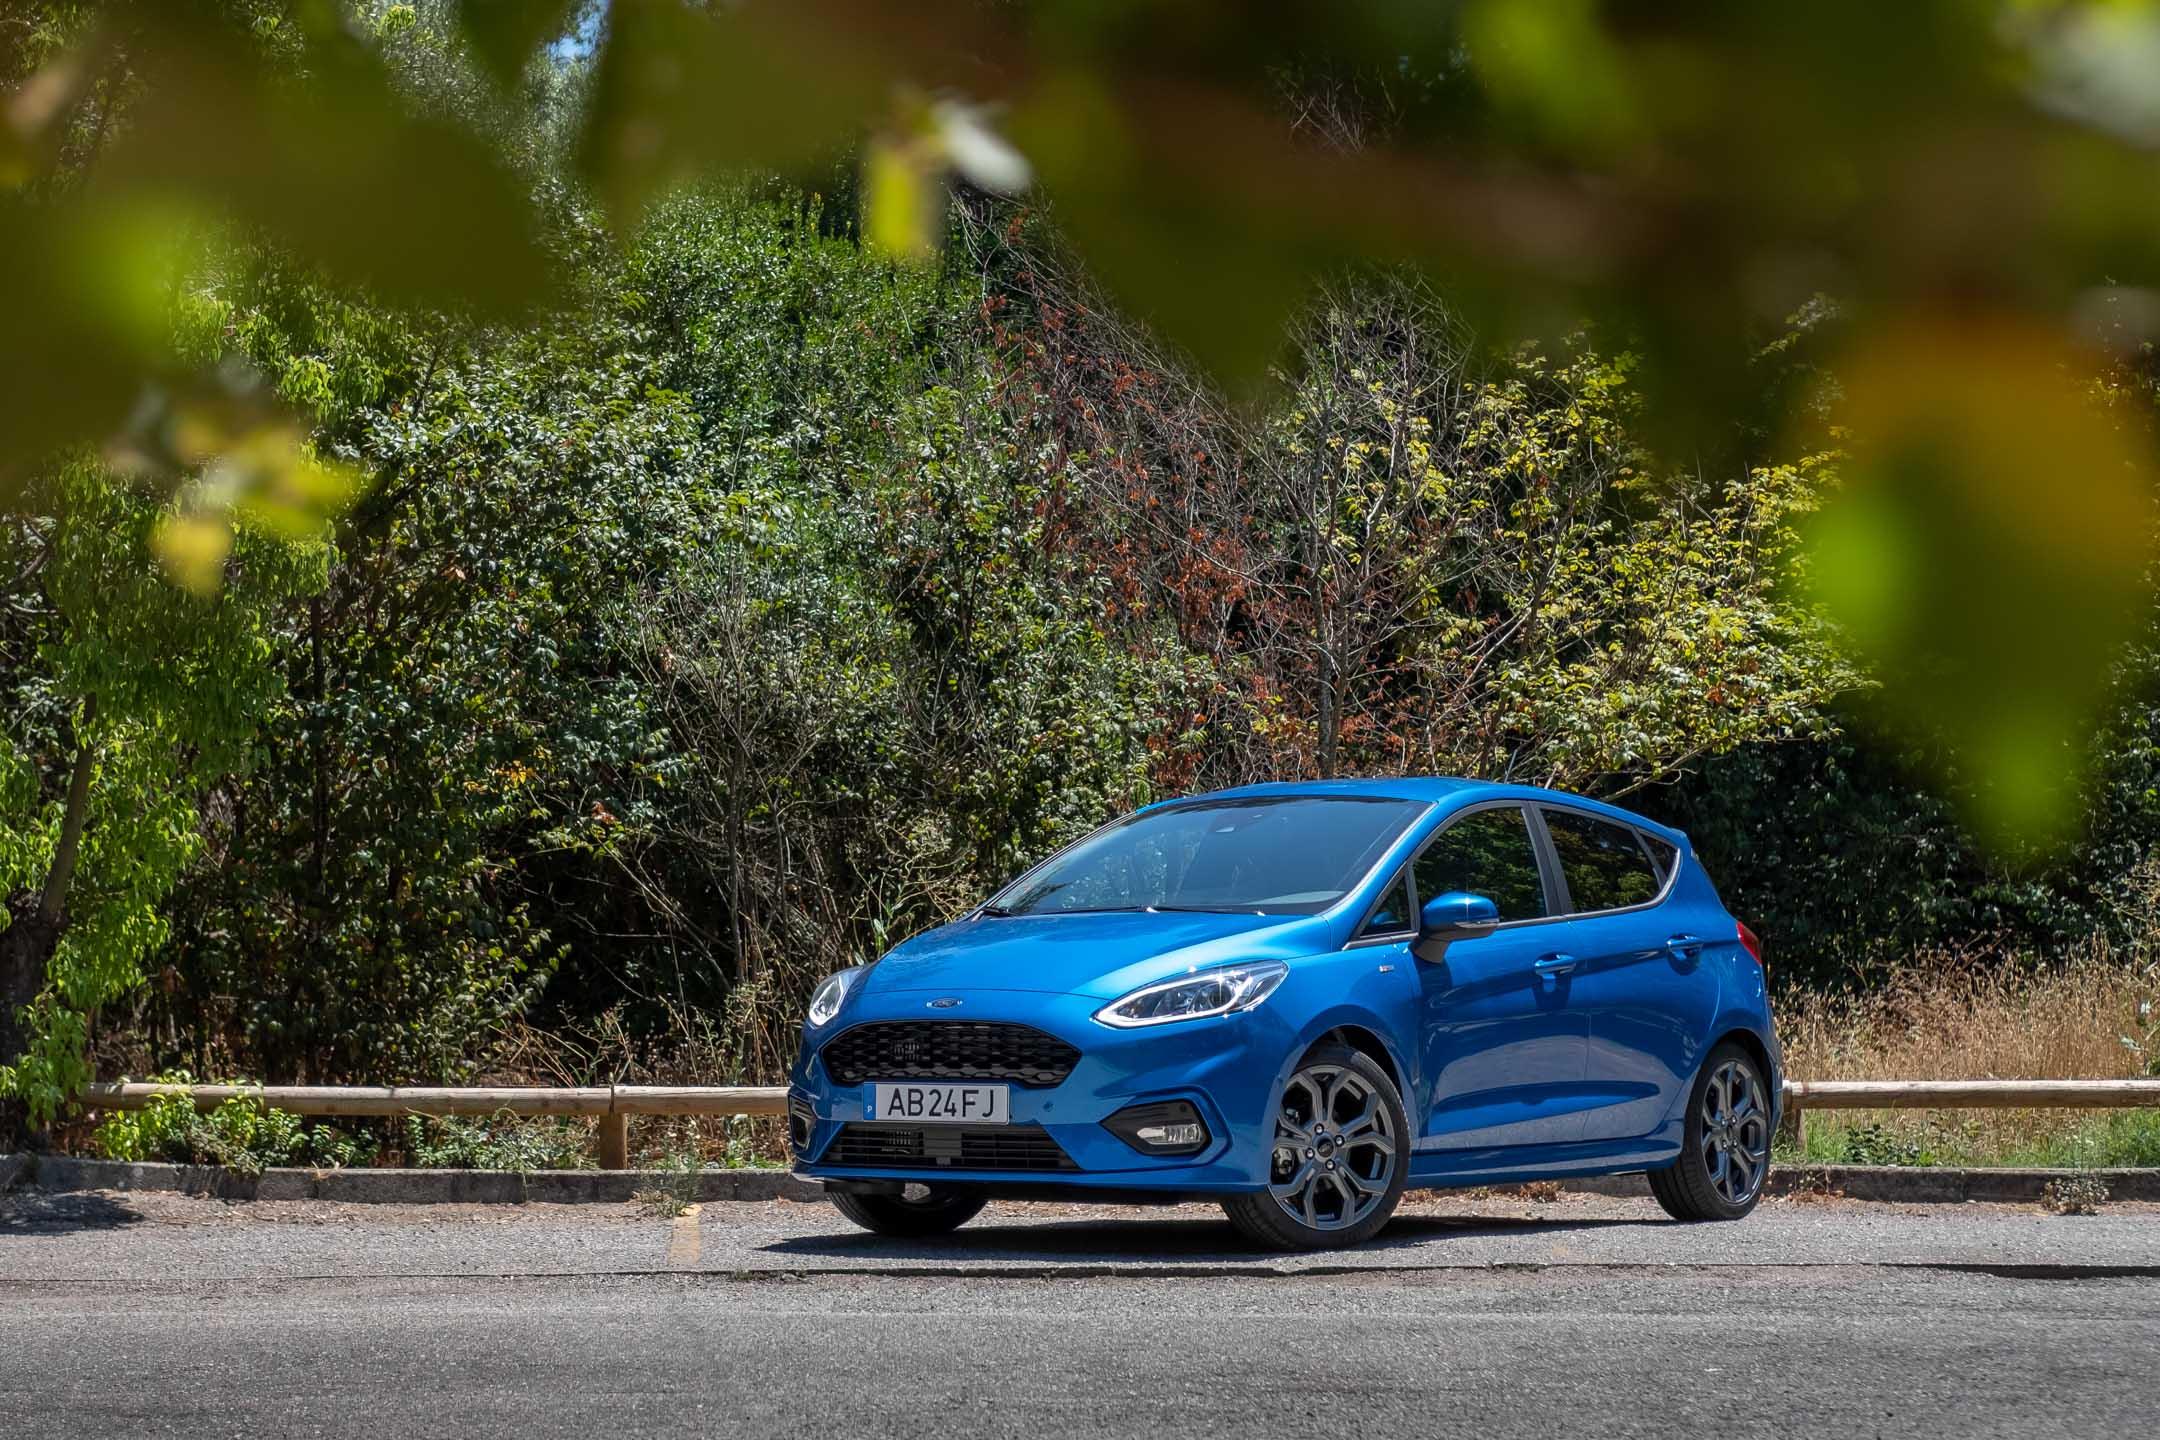 Ford Fiesta 1.0 Ecoboost ST Line